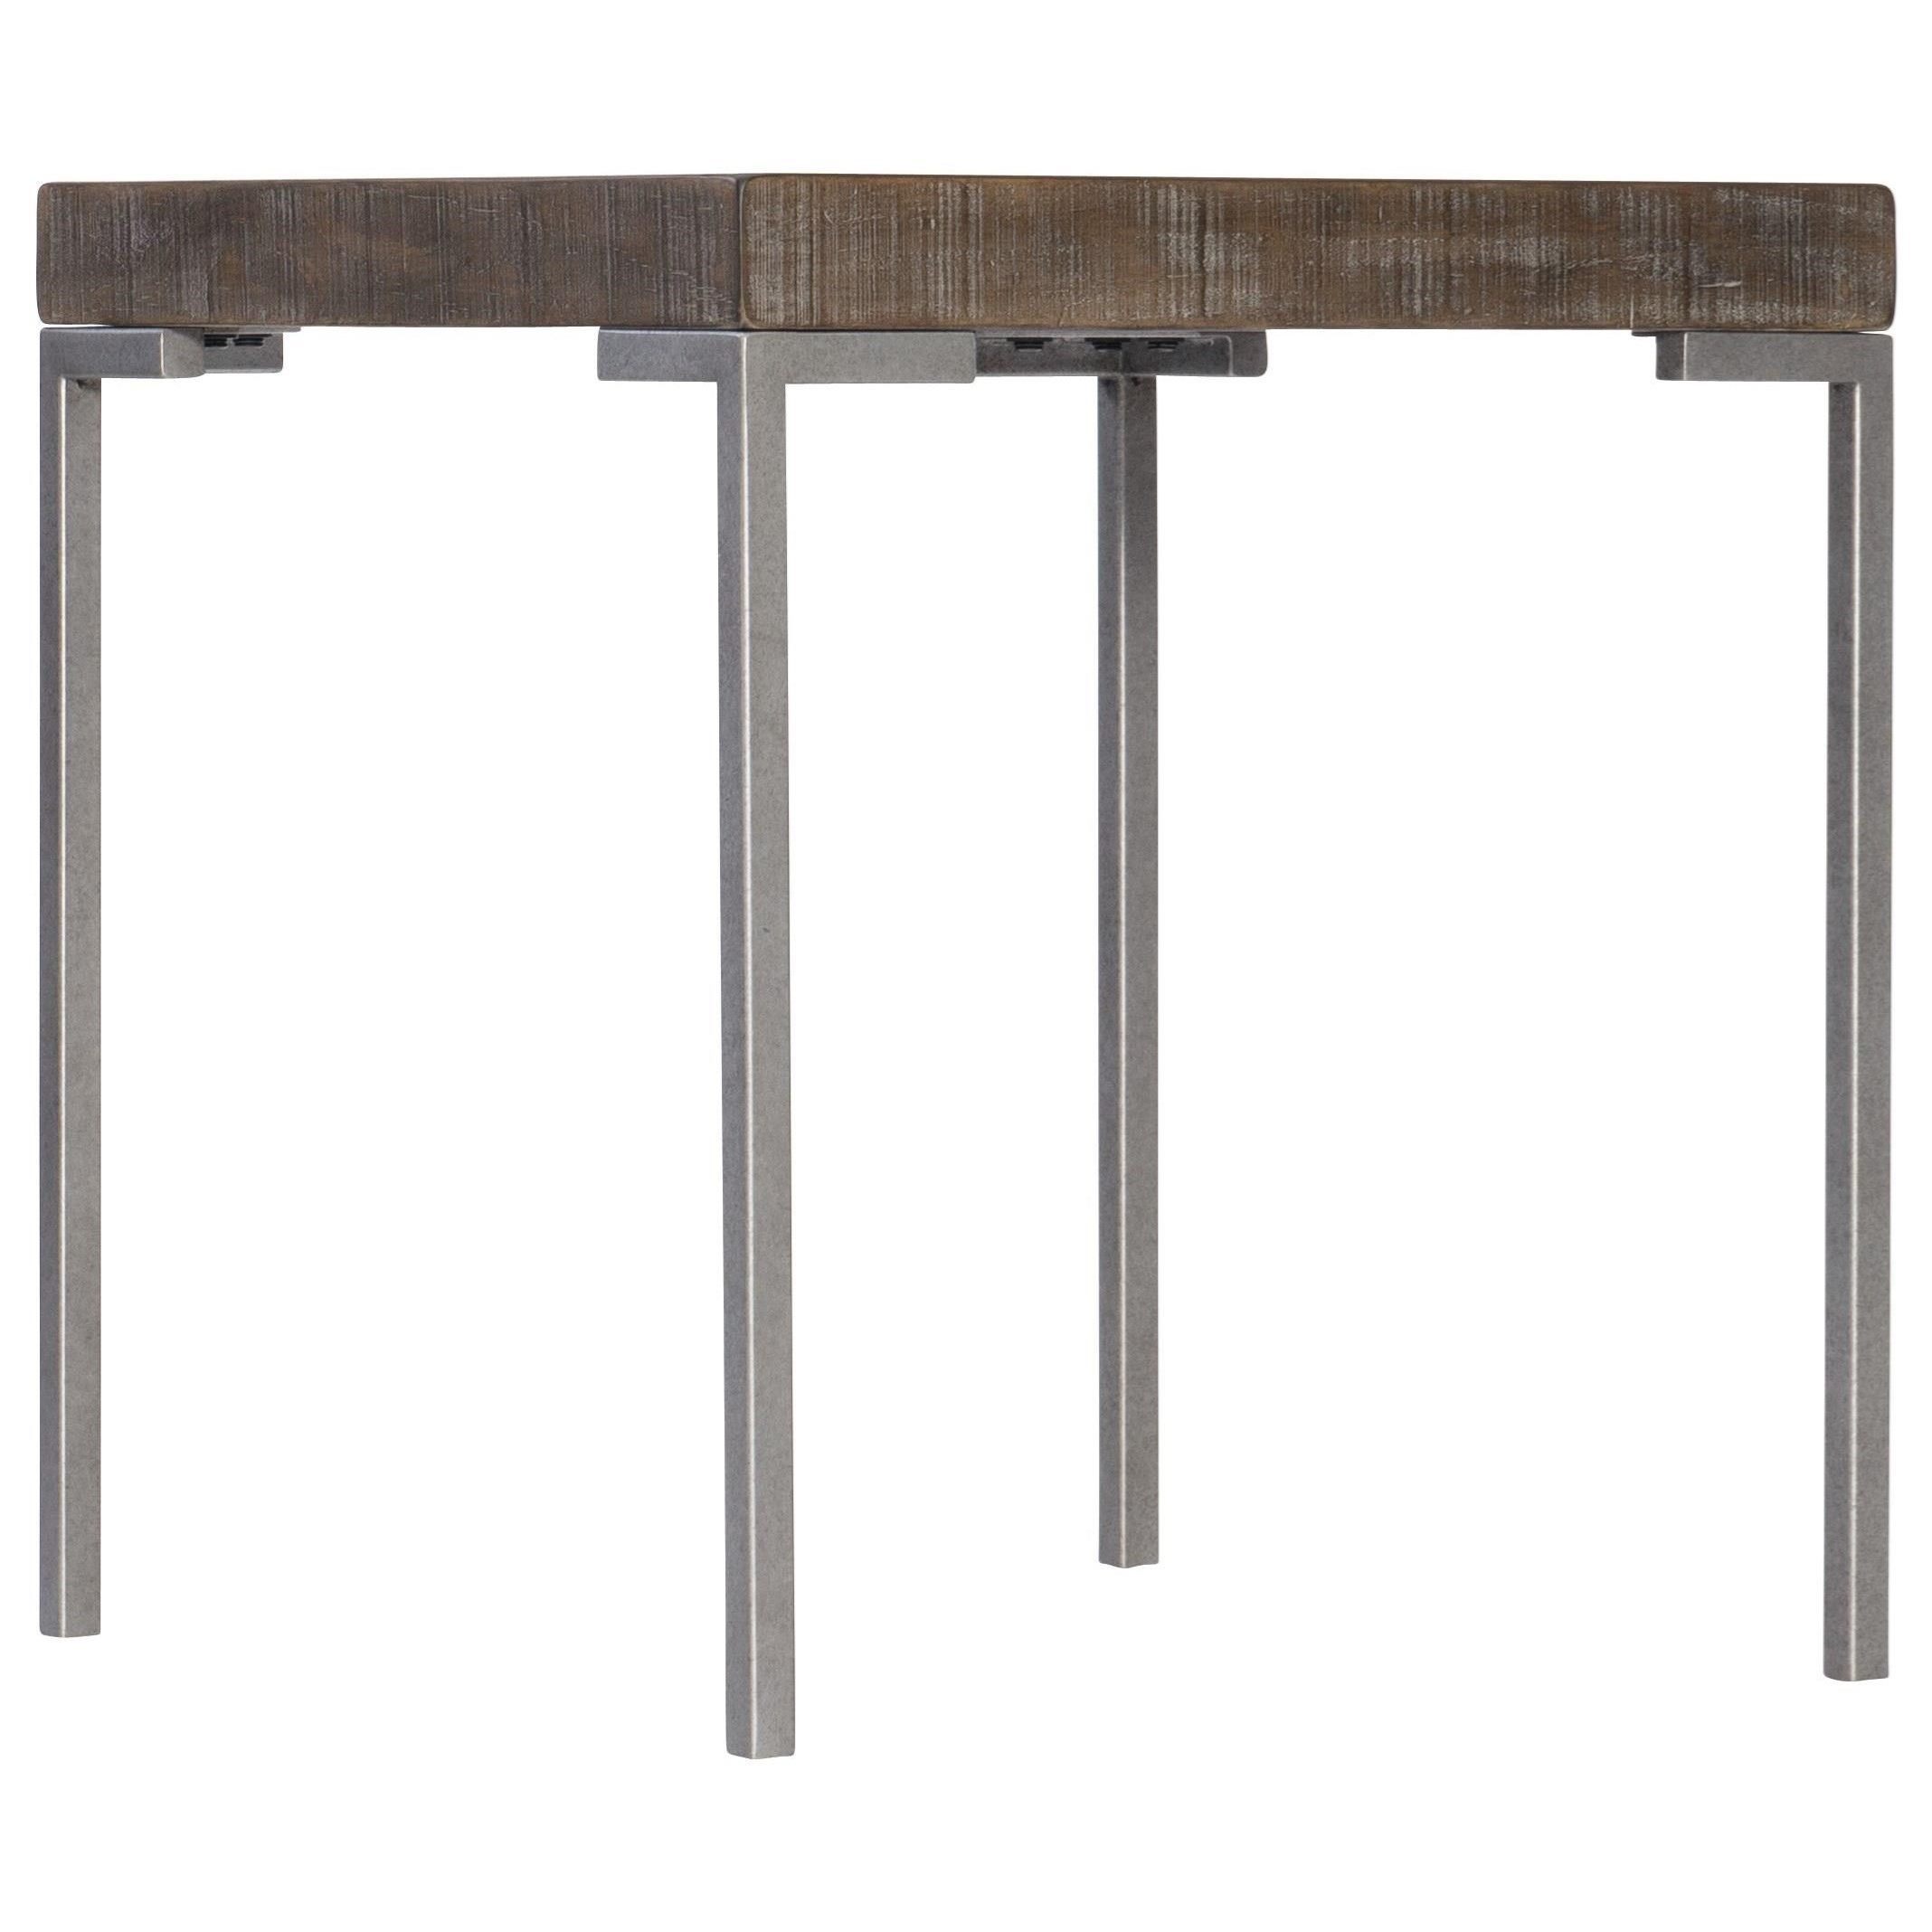 Loft - Logan Square Draper End Table at Williams & Kay